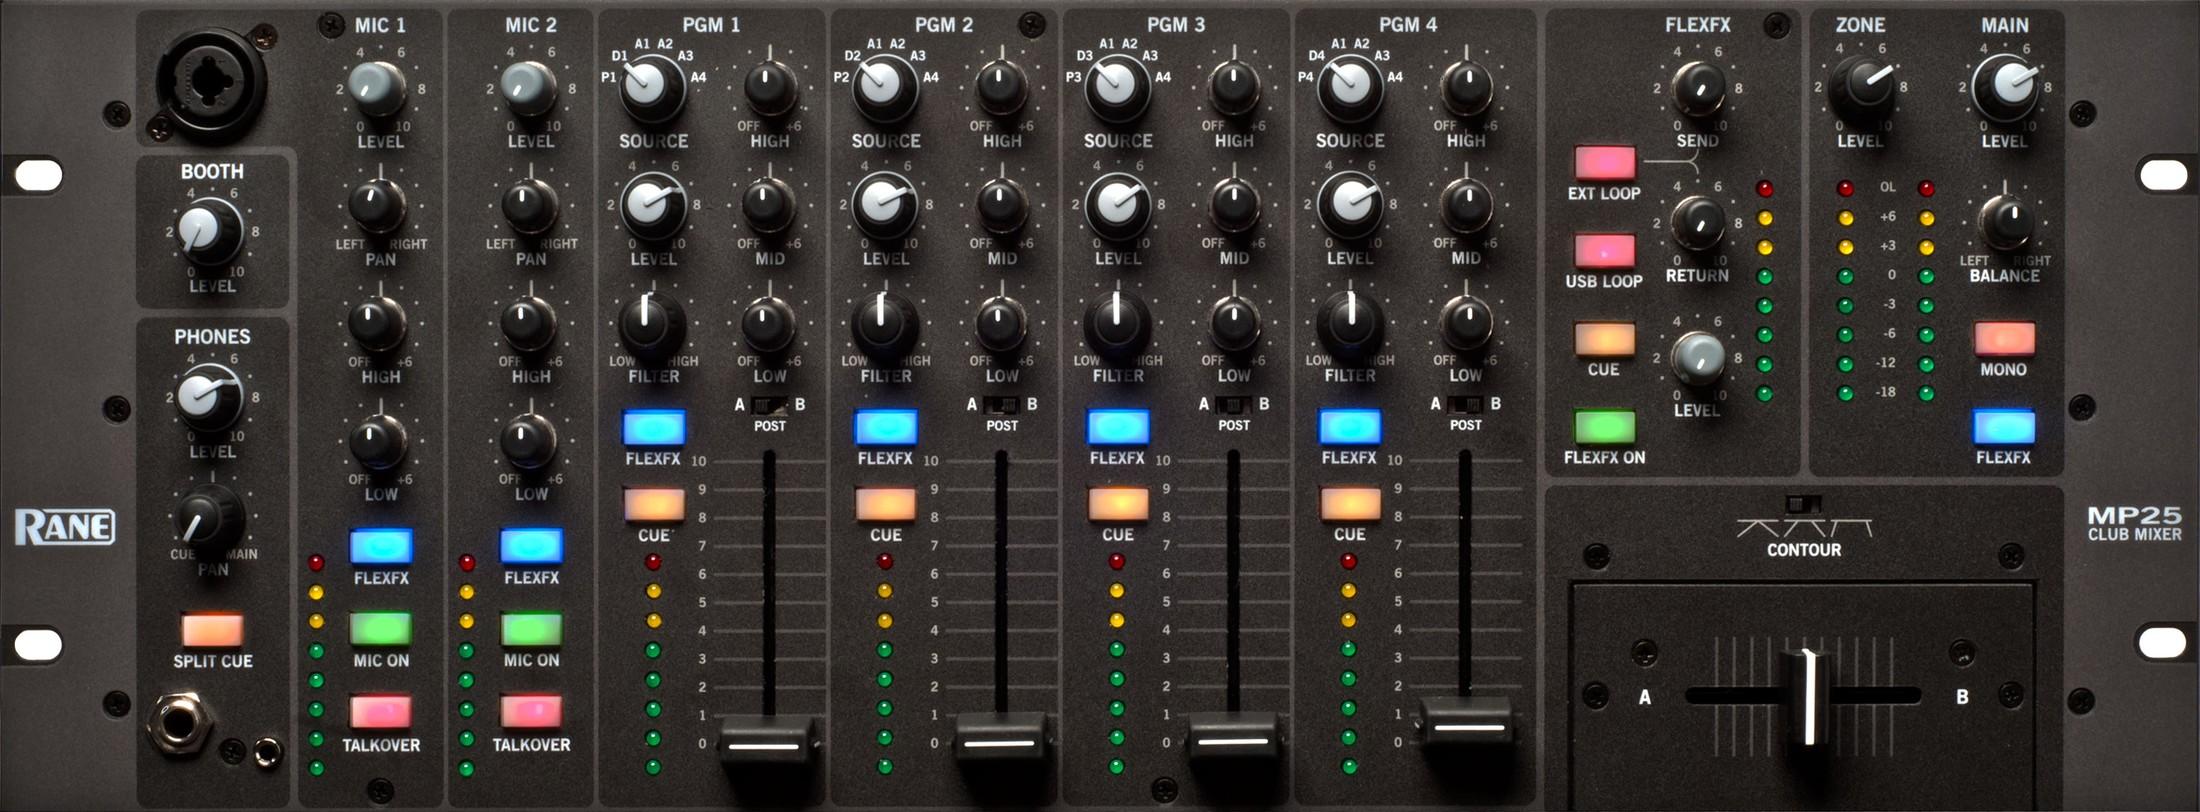 Rane Mp25 Dj Mixer With Usb Audio Interface